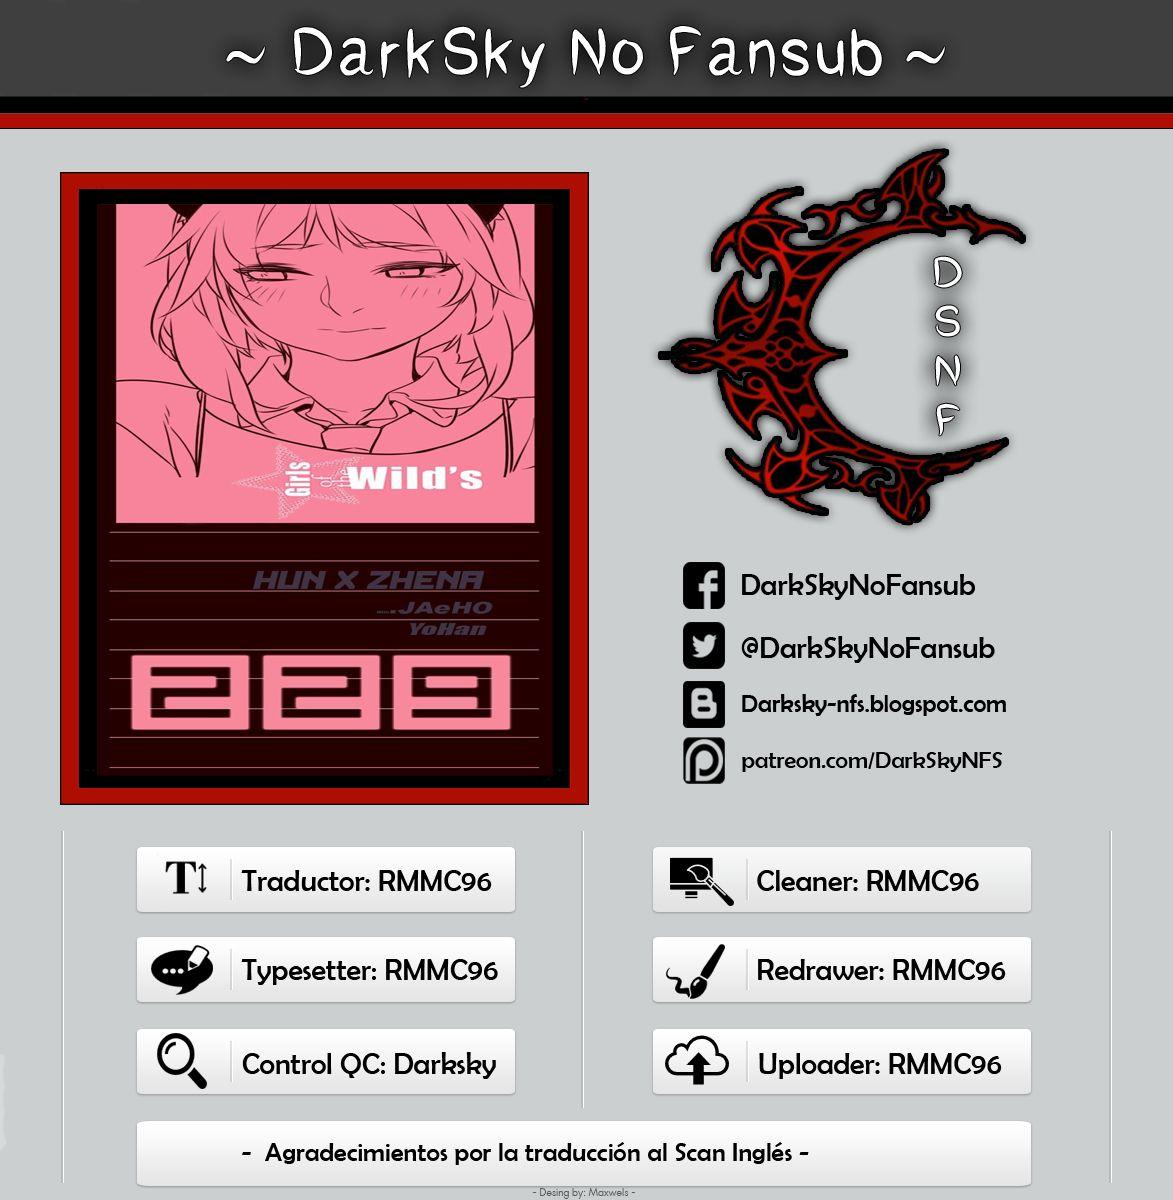 https://c5.ninemanga.com/es_manga/32/416/453465/8e1b6031314d35dffa354563befb9f70.jpg Page 1